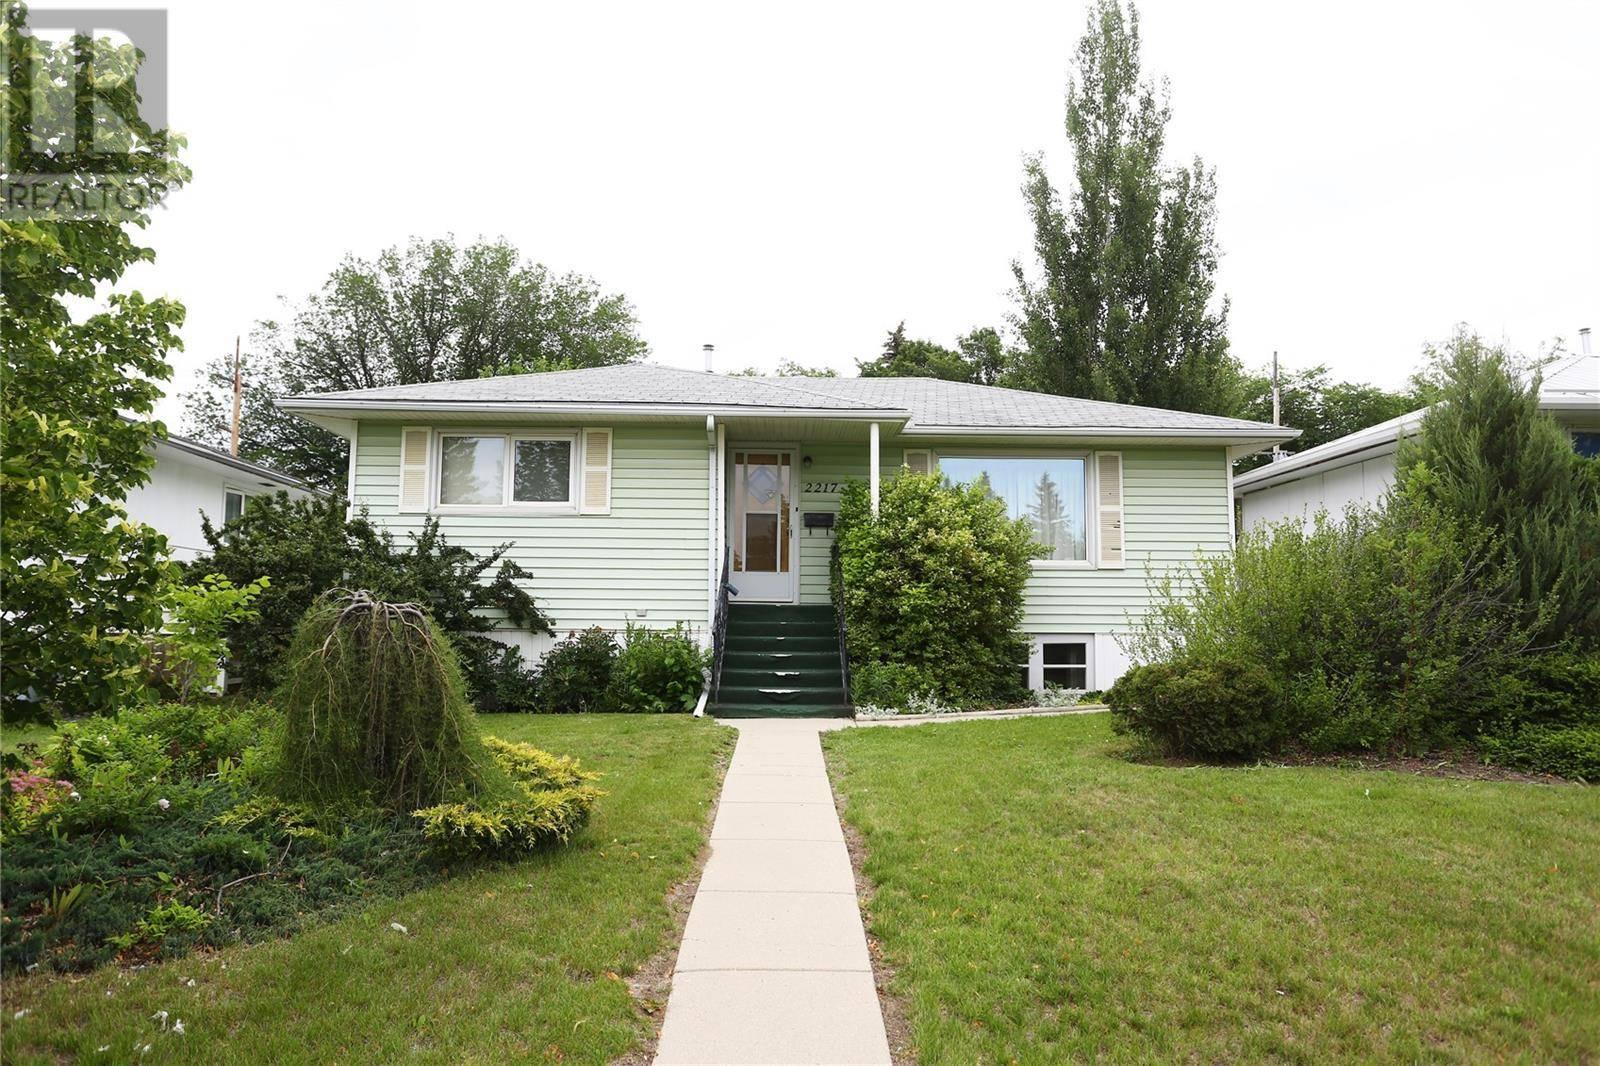 House for sale at 2217 Broadway Ave Saskatoon Saskatchewan - MLS: SK783624